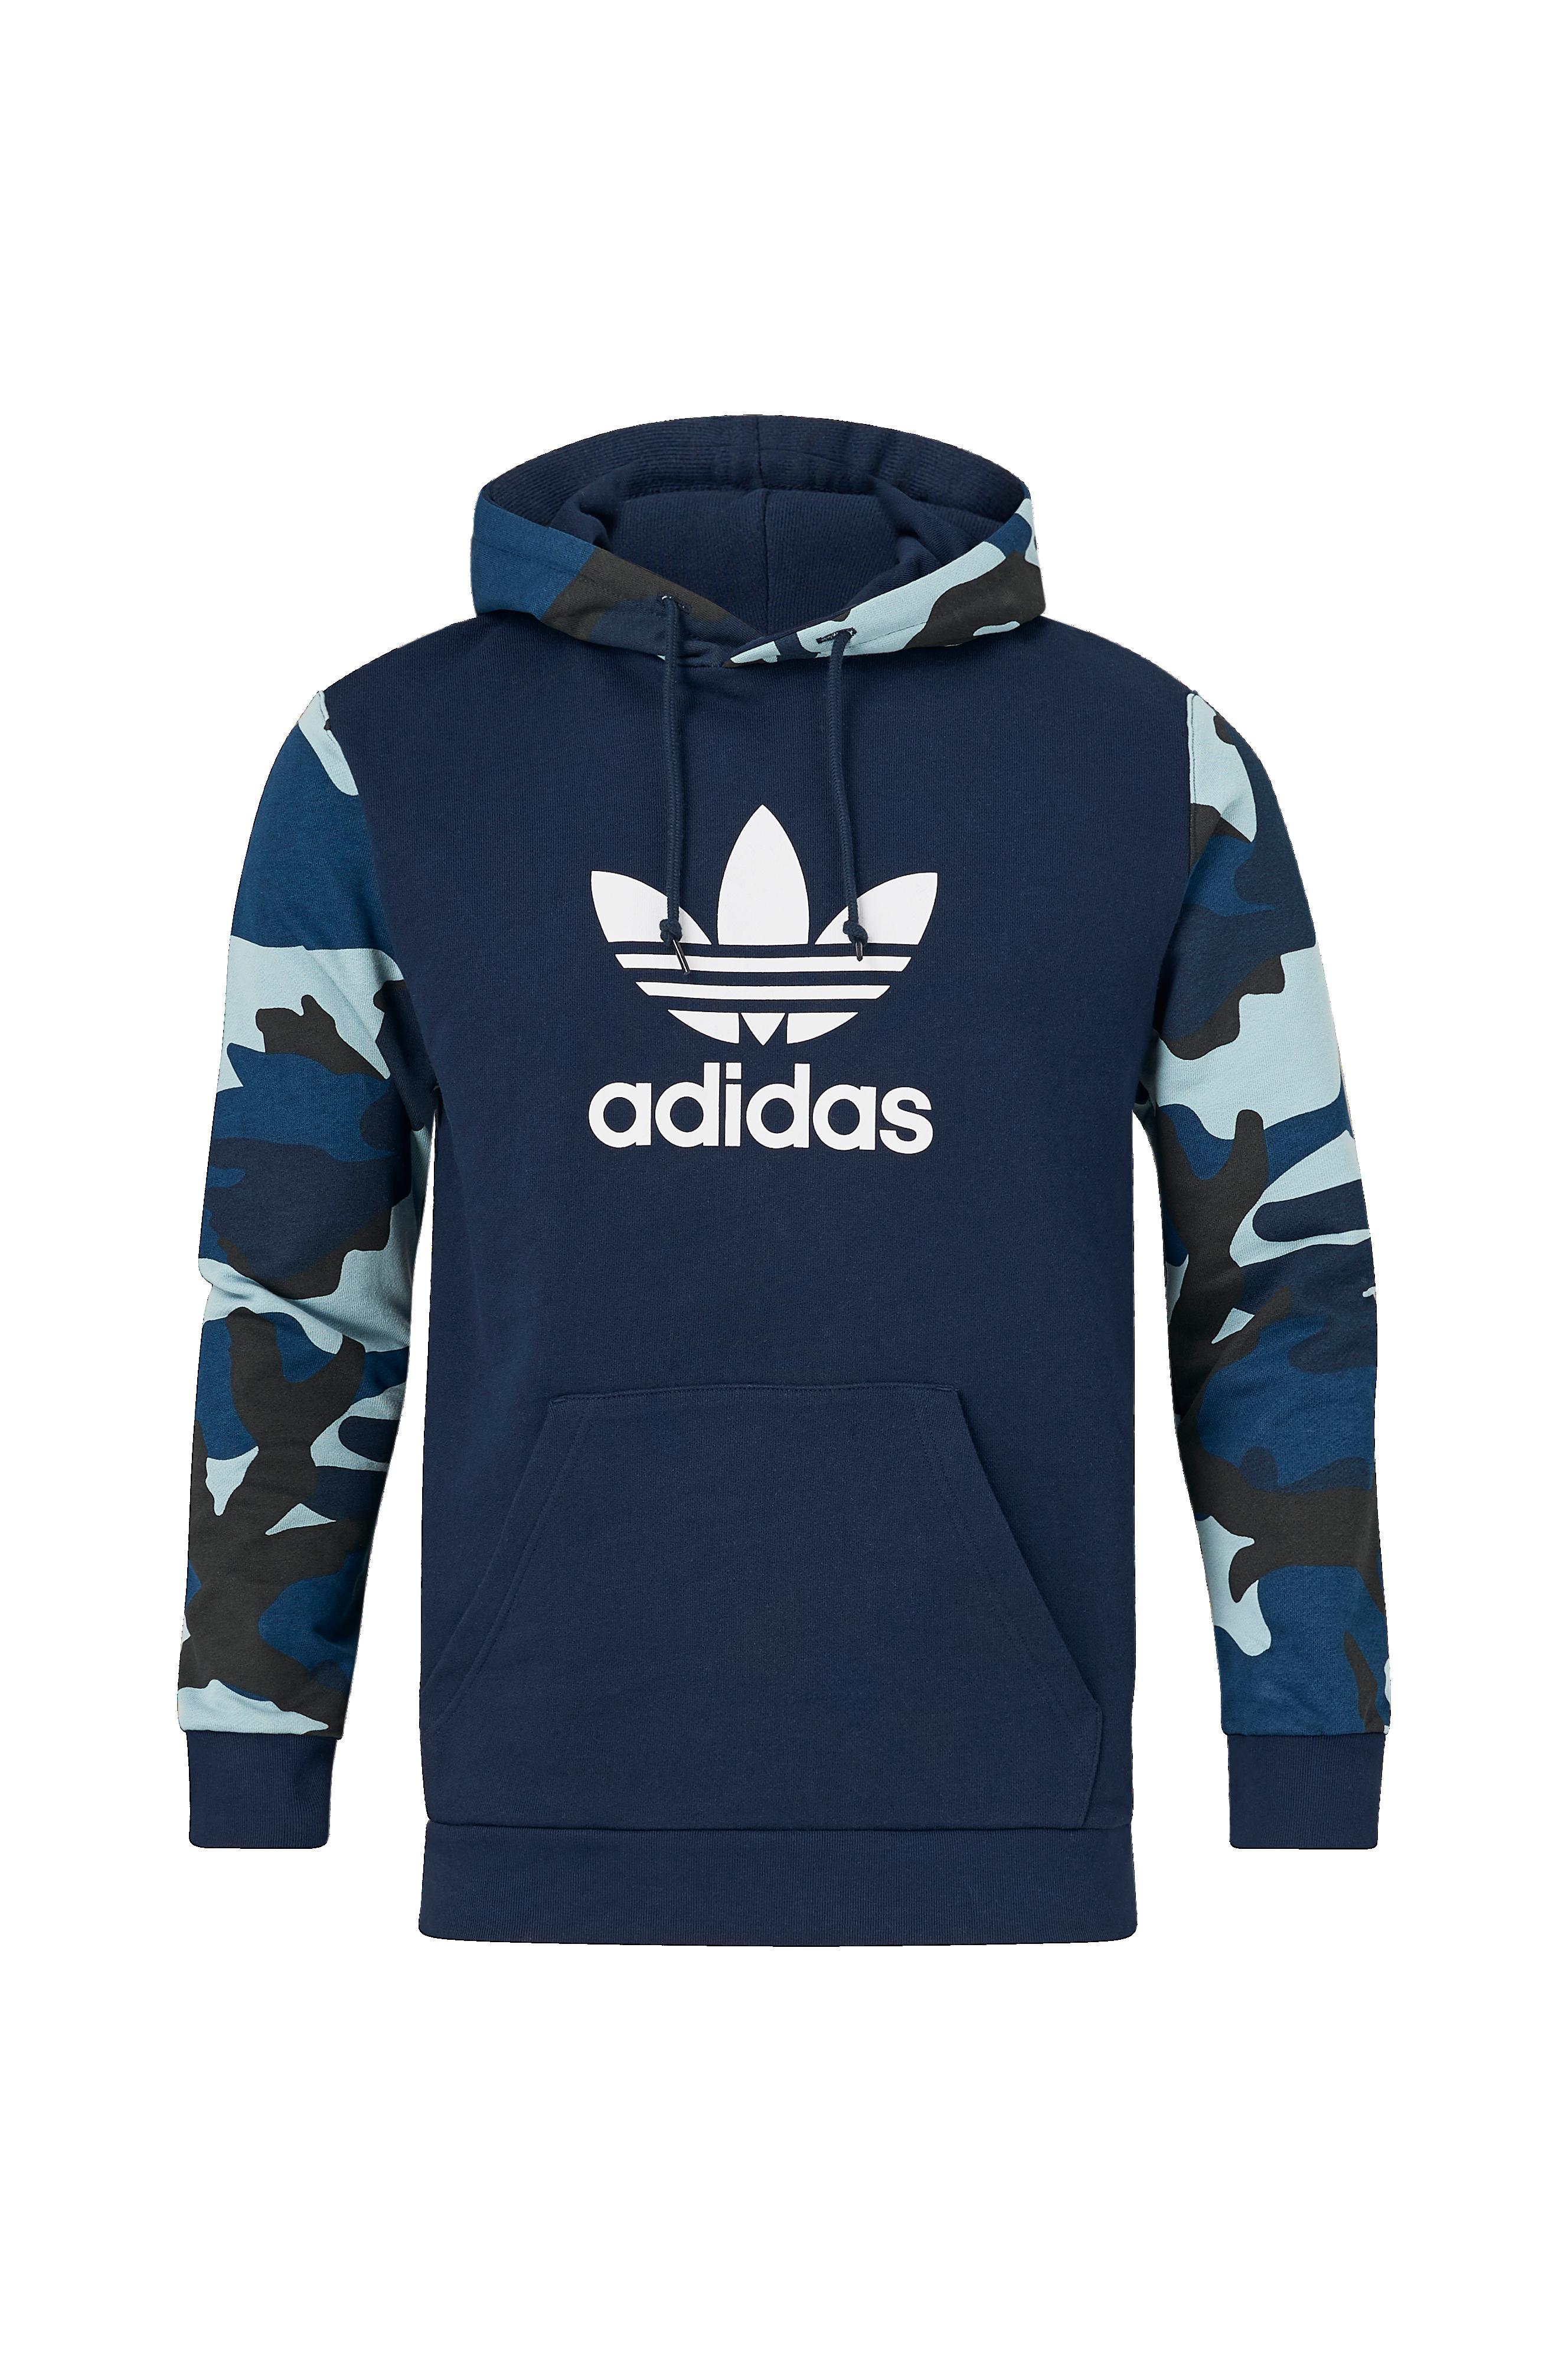 adidas Originals Hettegenser Camouflage Hoodie Blå Herre